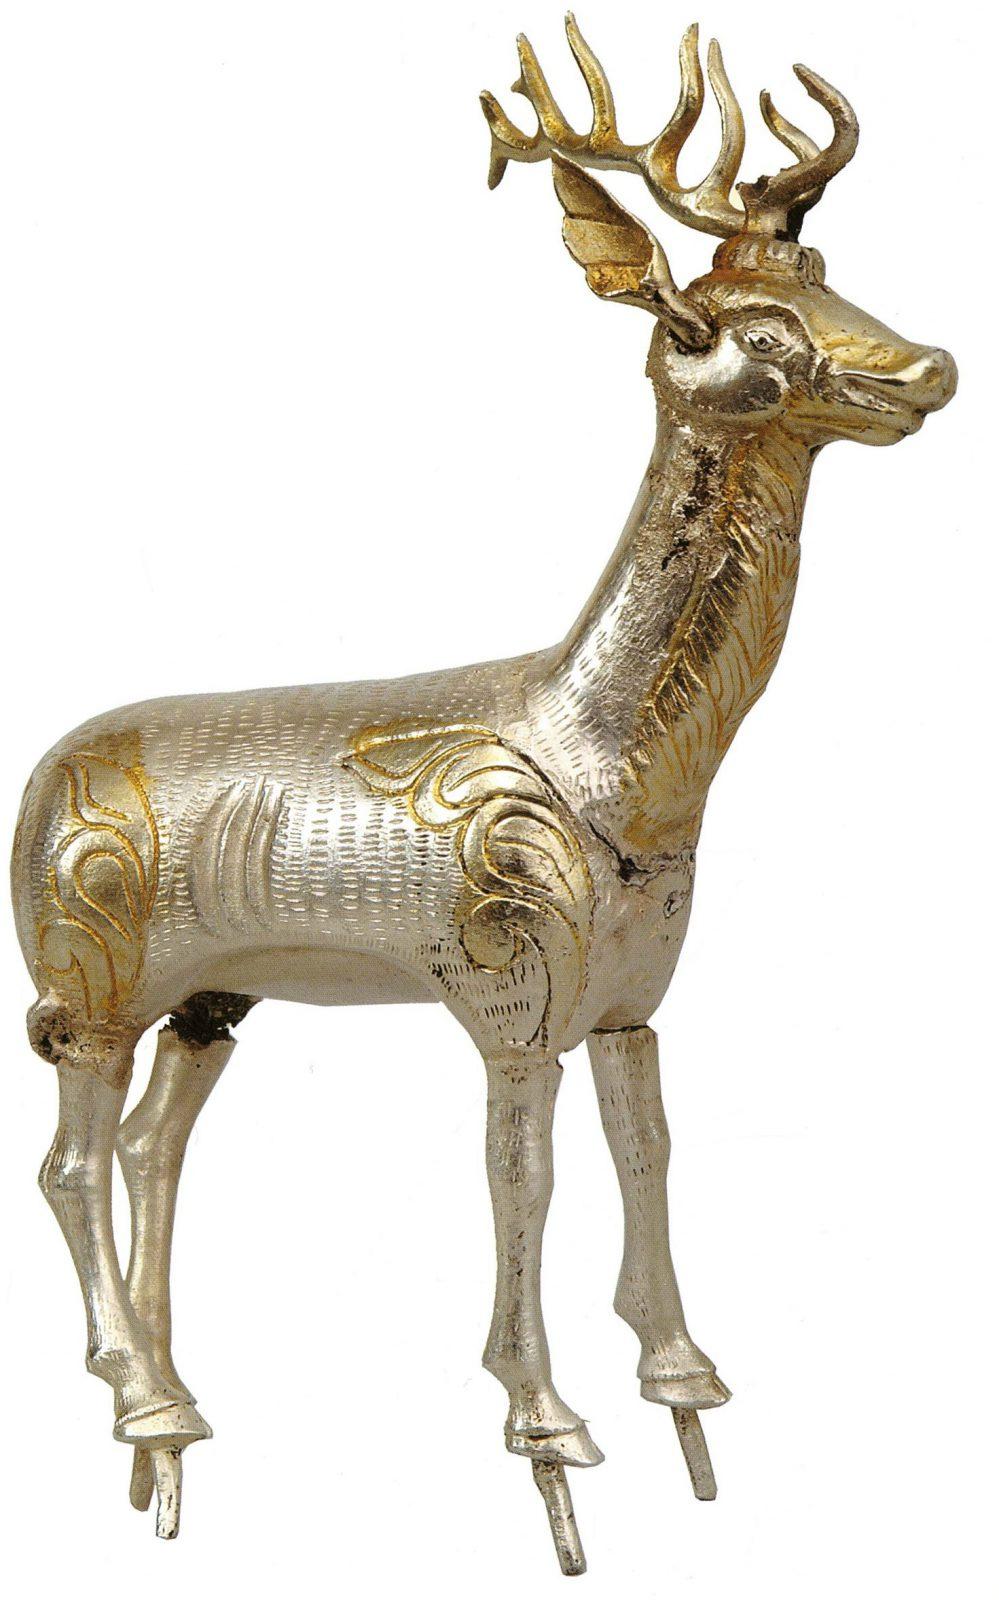 Deer statue with antlers